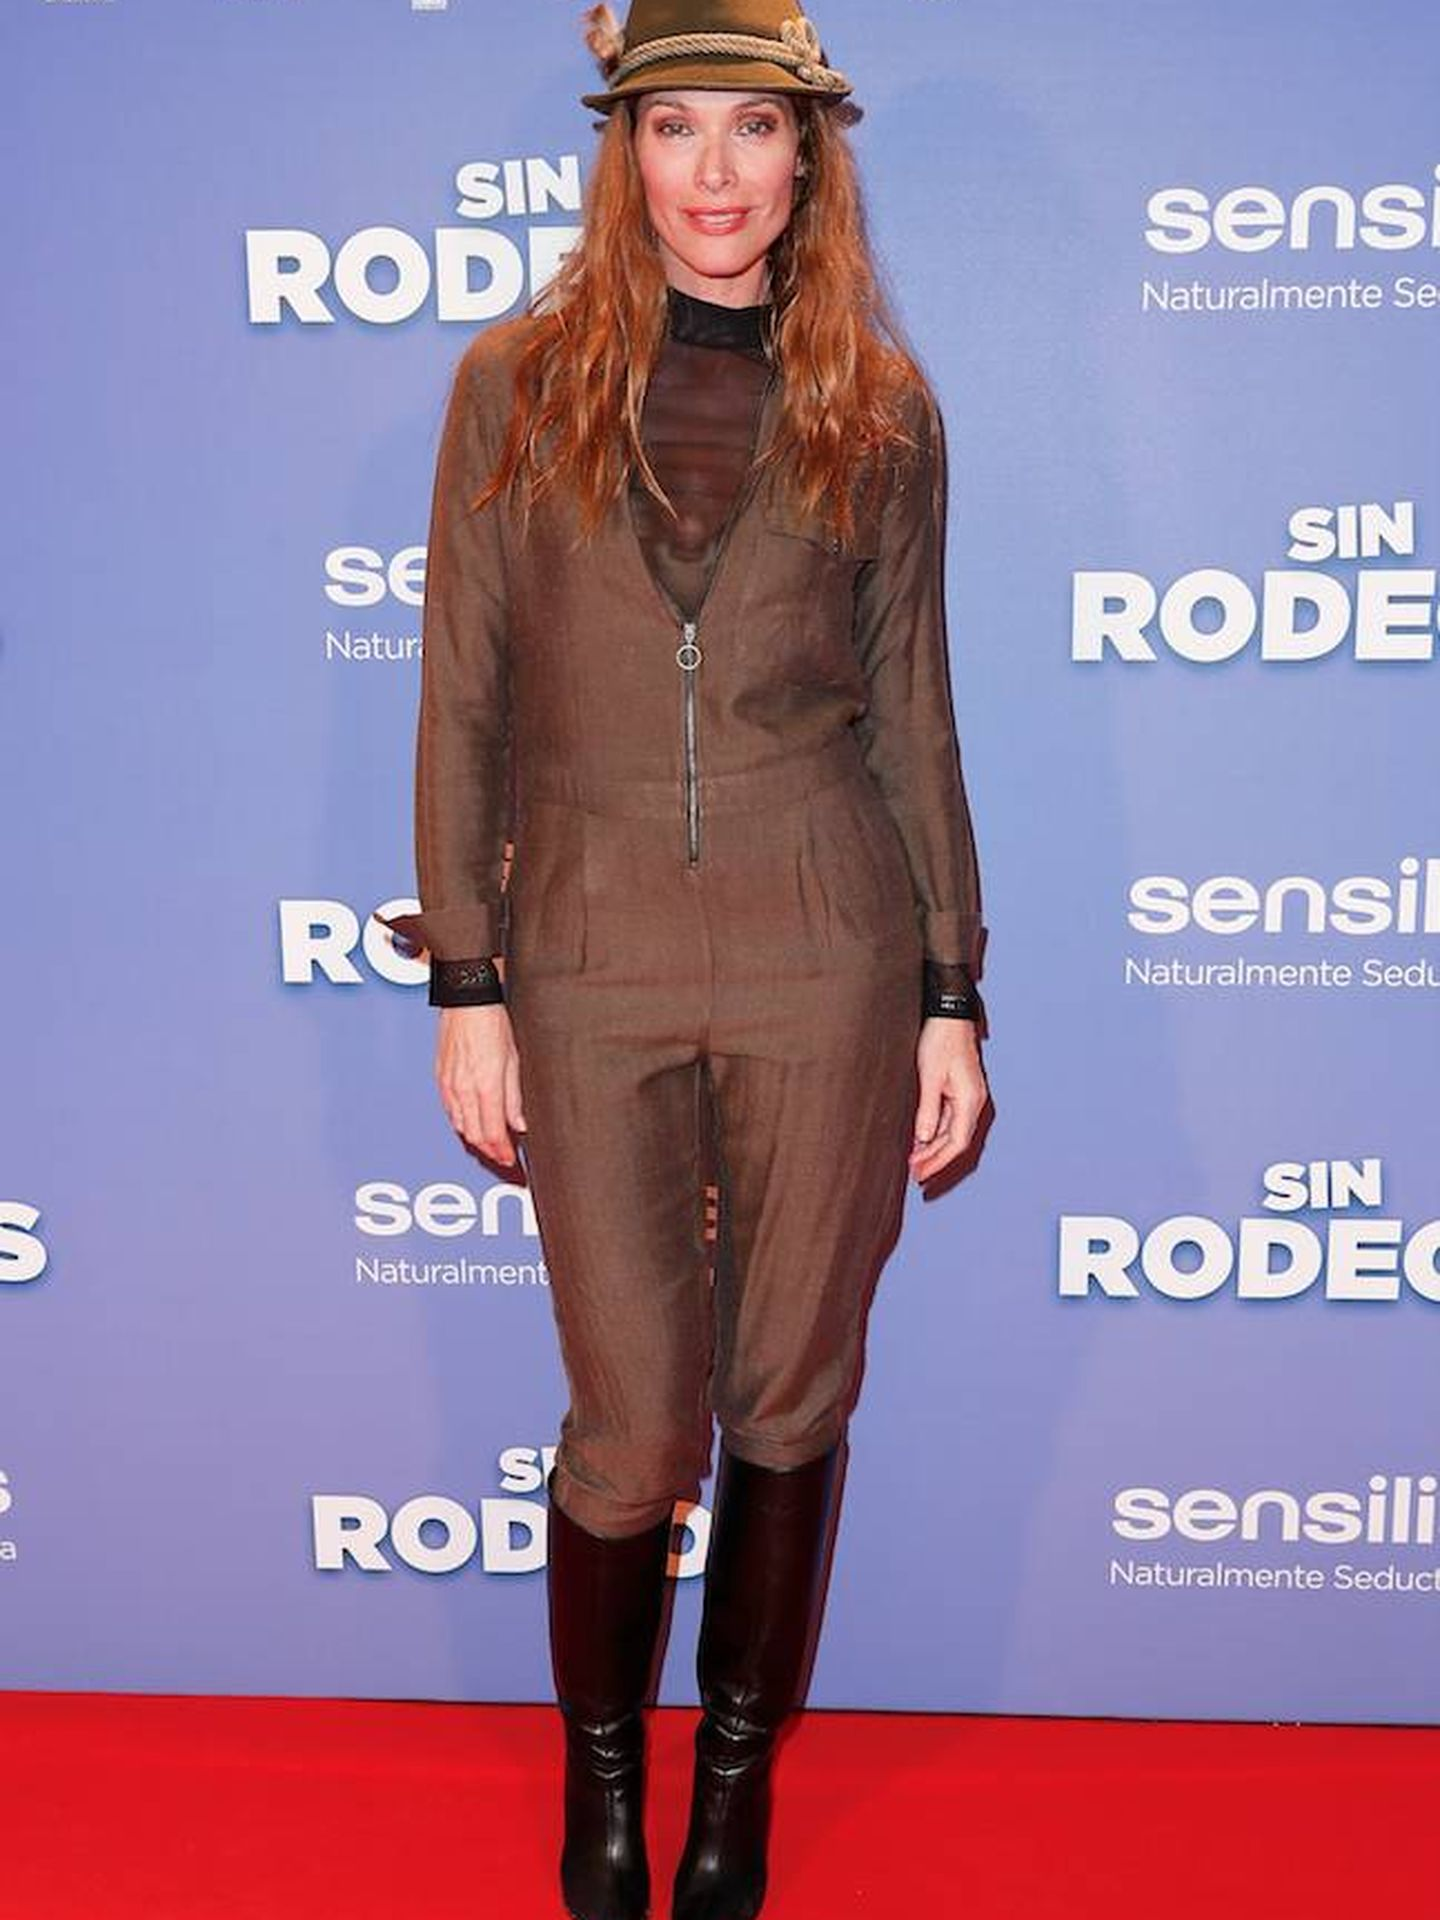 La modelo Cristina Piaget. (Gtres)